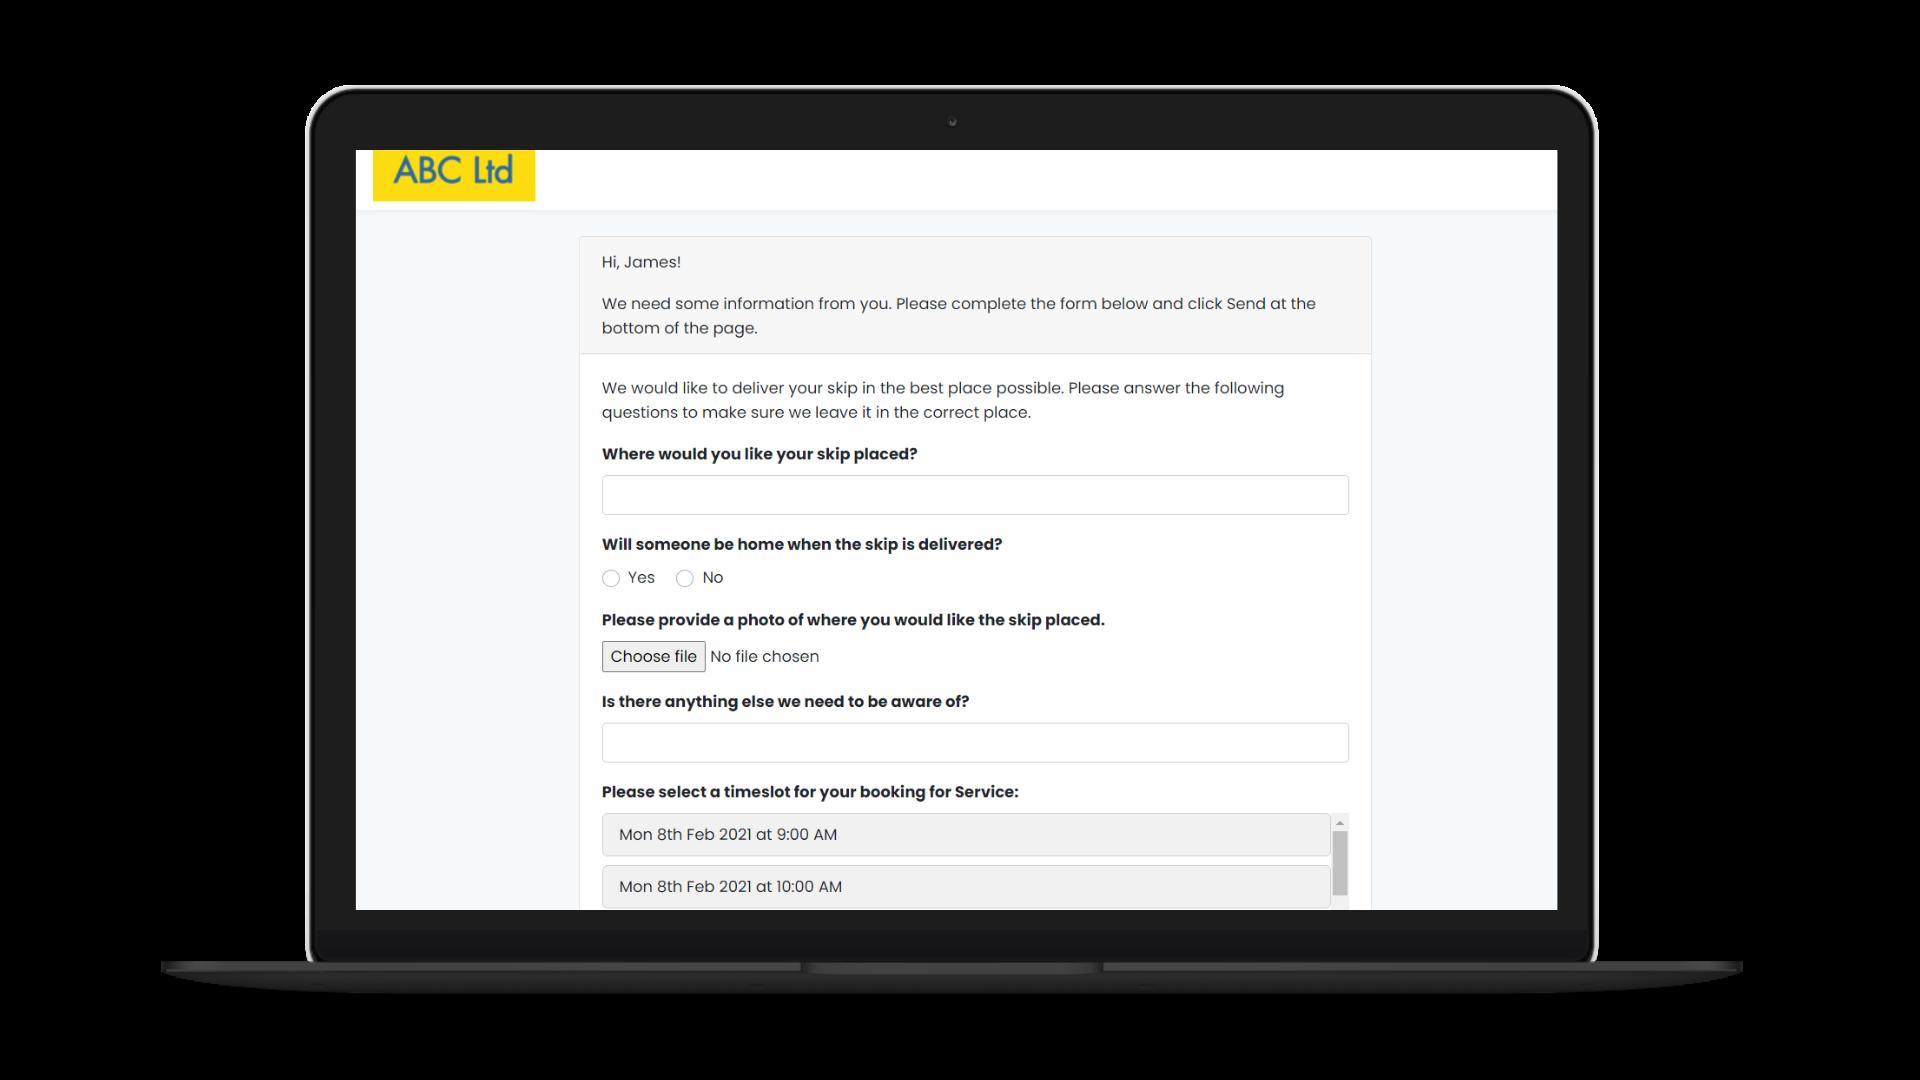 Information Request screenshot